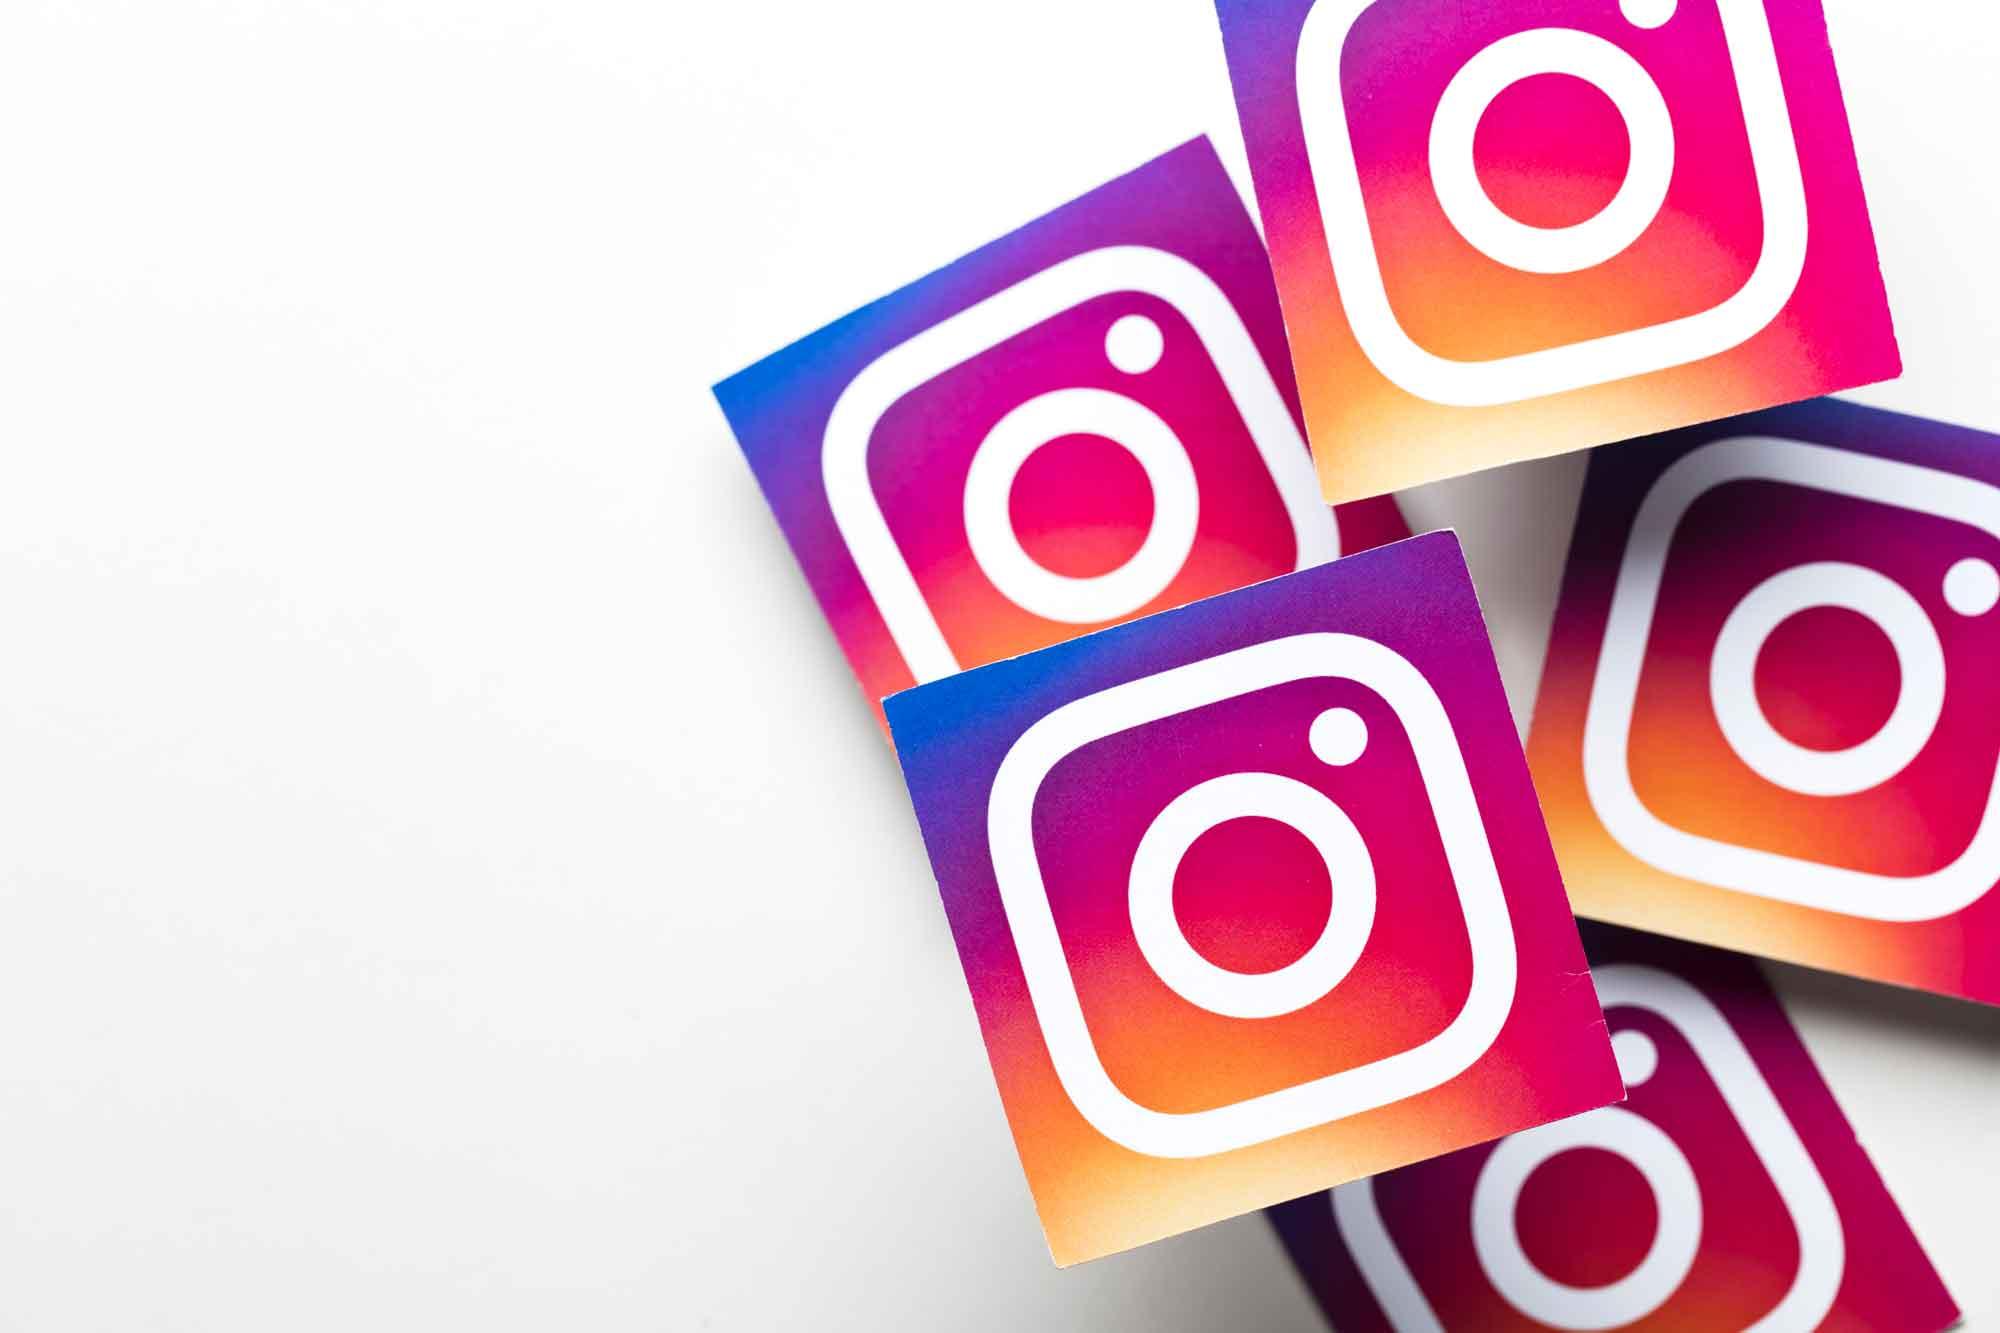 instagram-logo-image